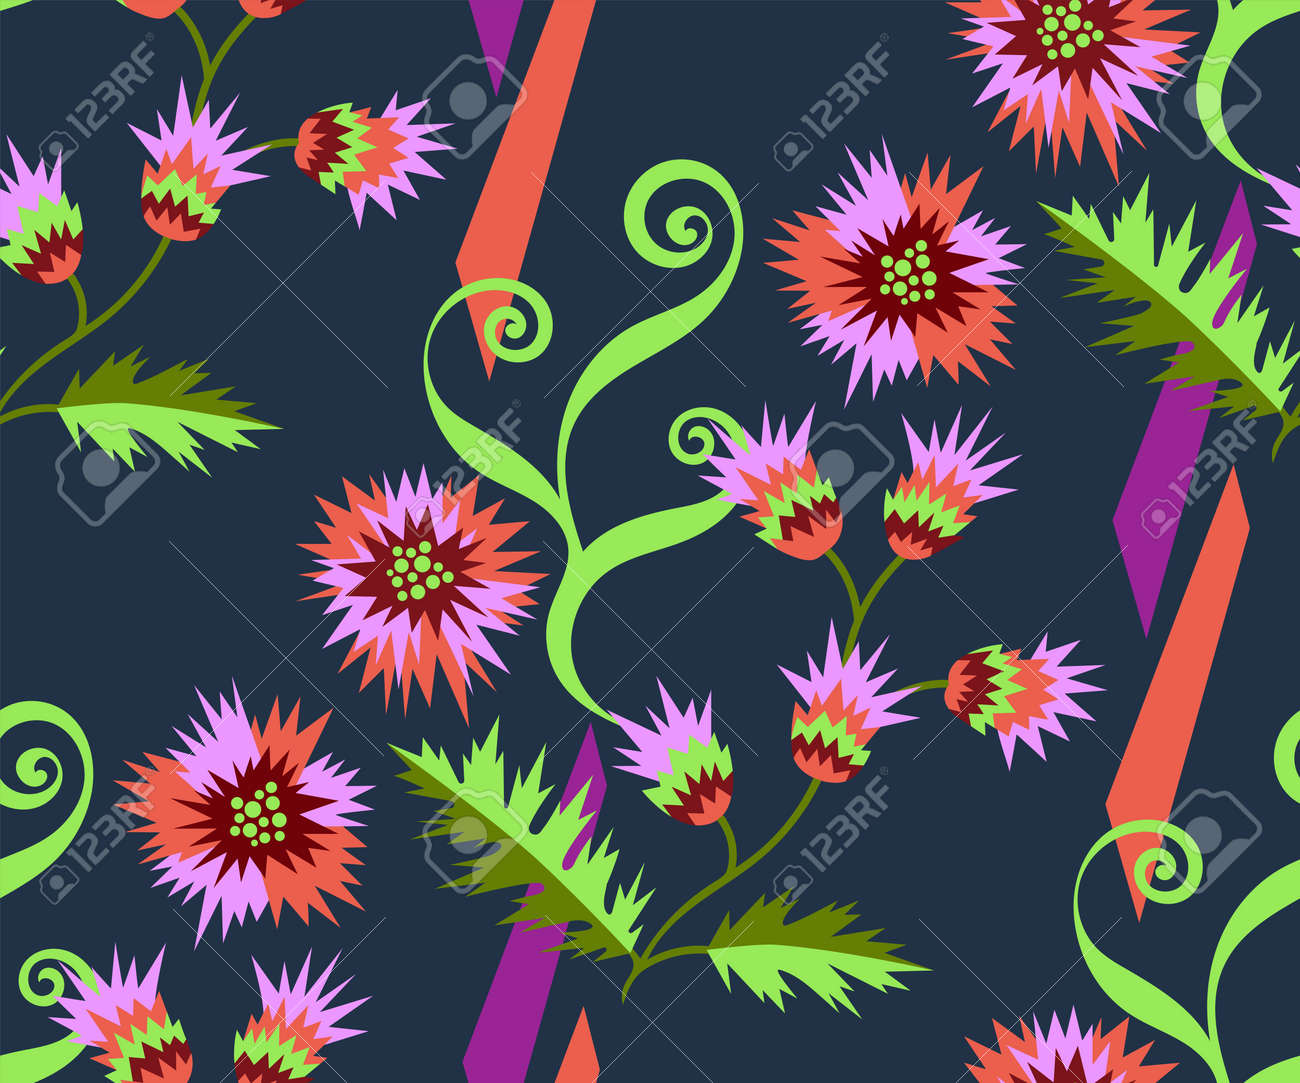 background abstract artwork. Hand drawn ink illustration. Modern ornamental decorative background. - 155464203